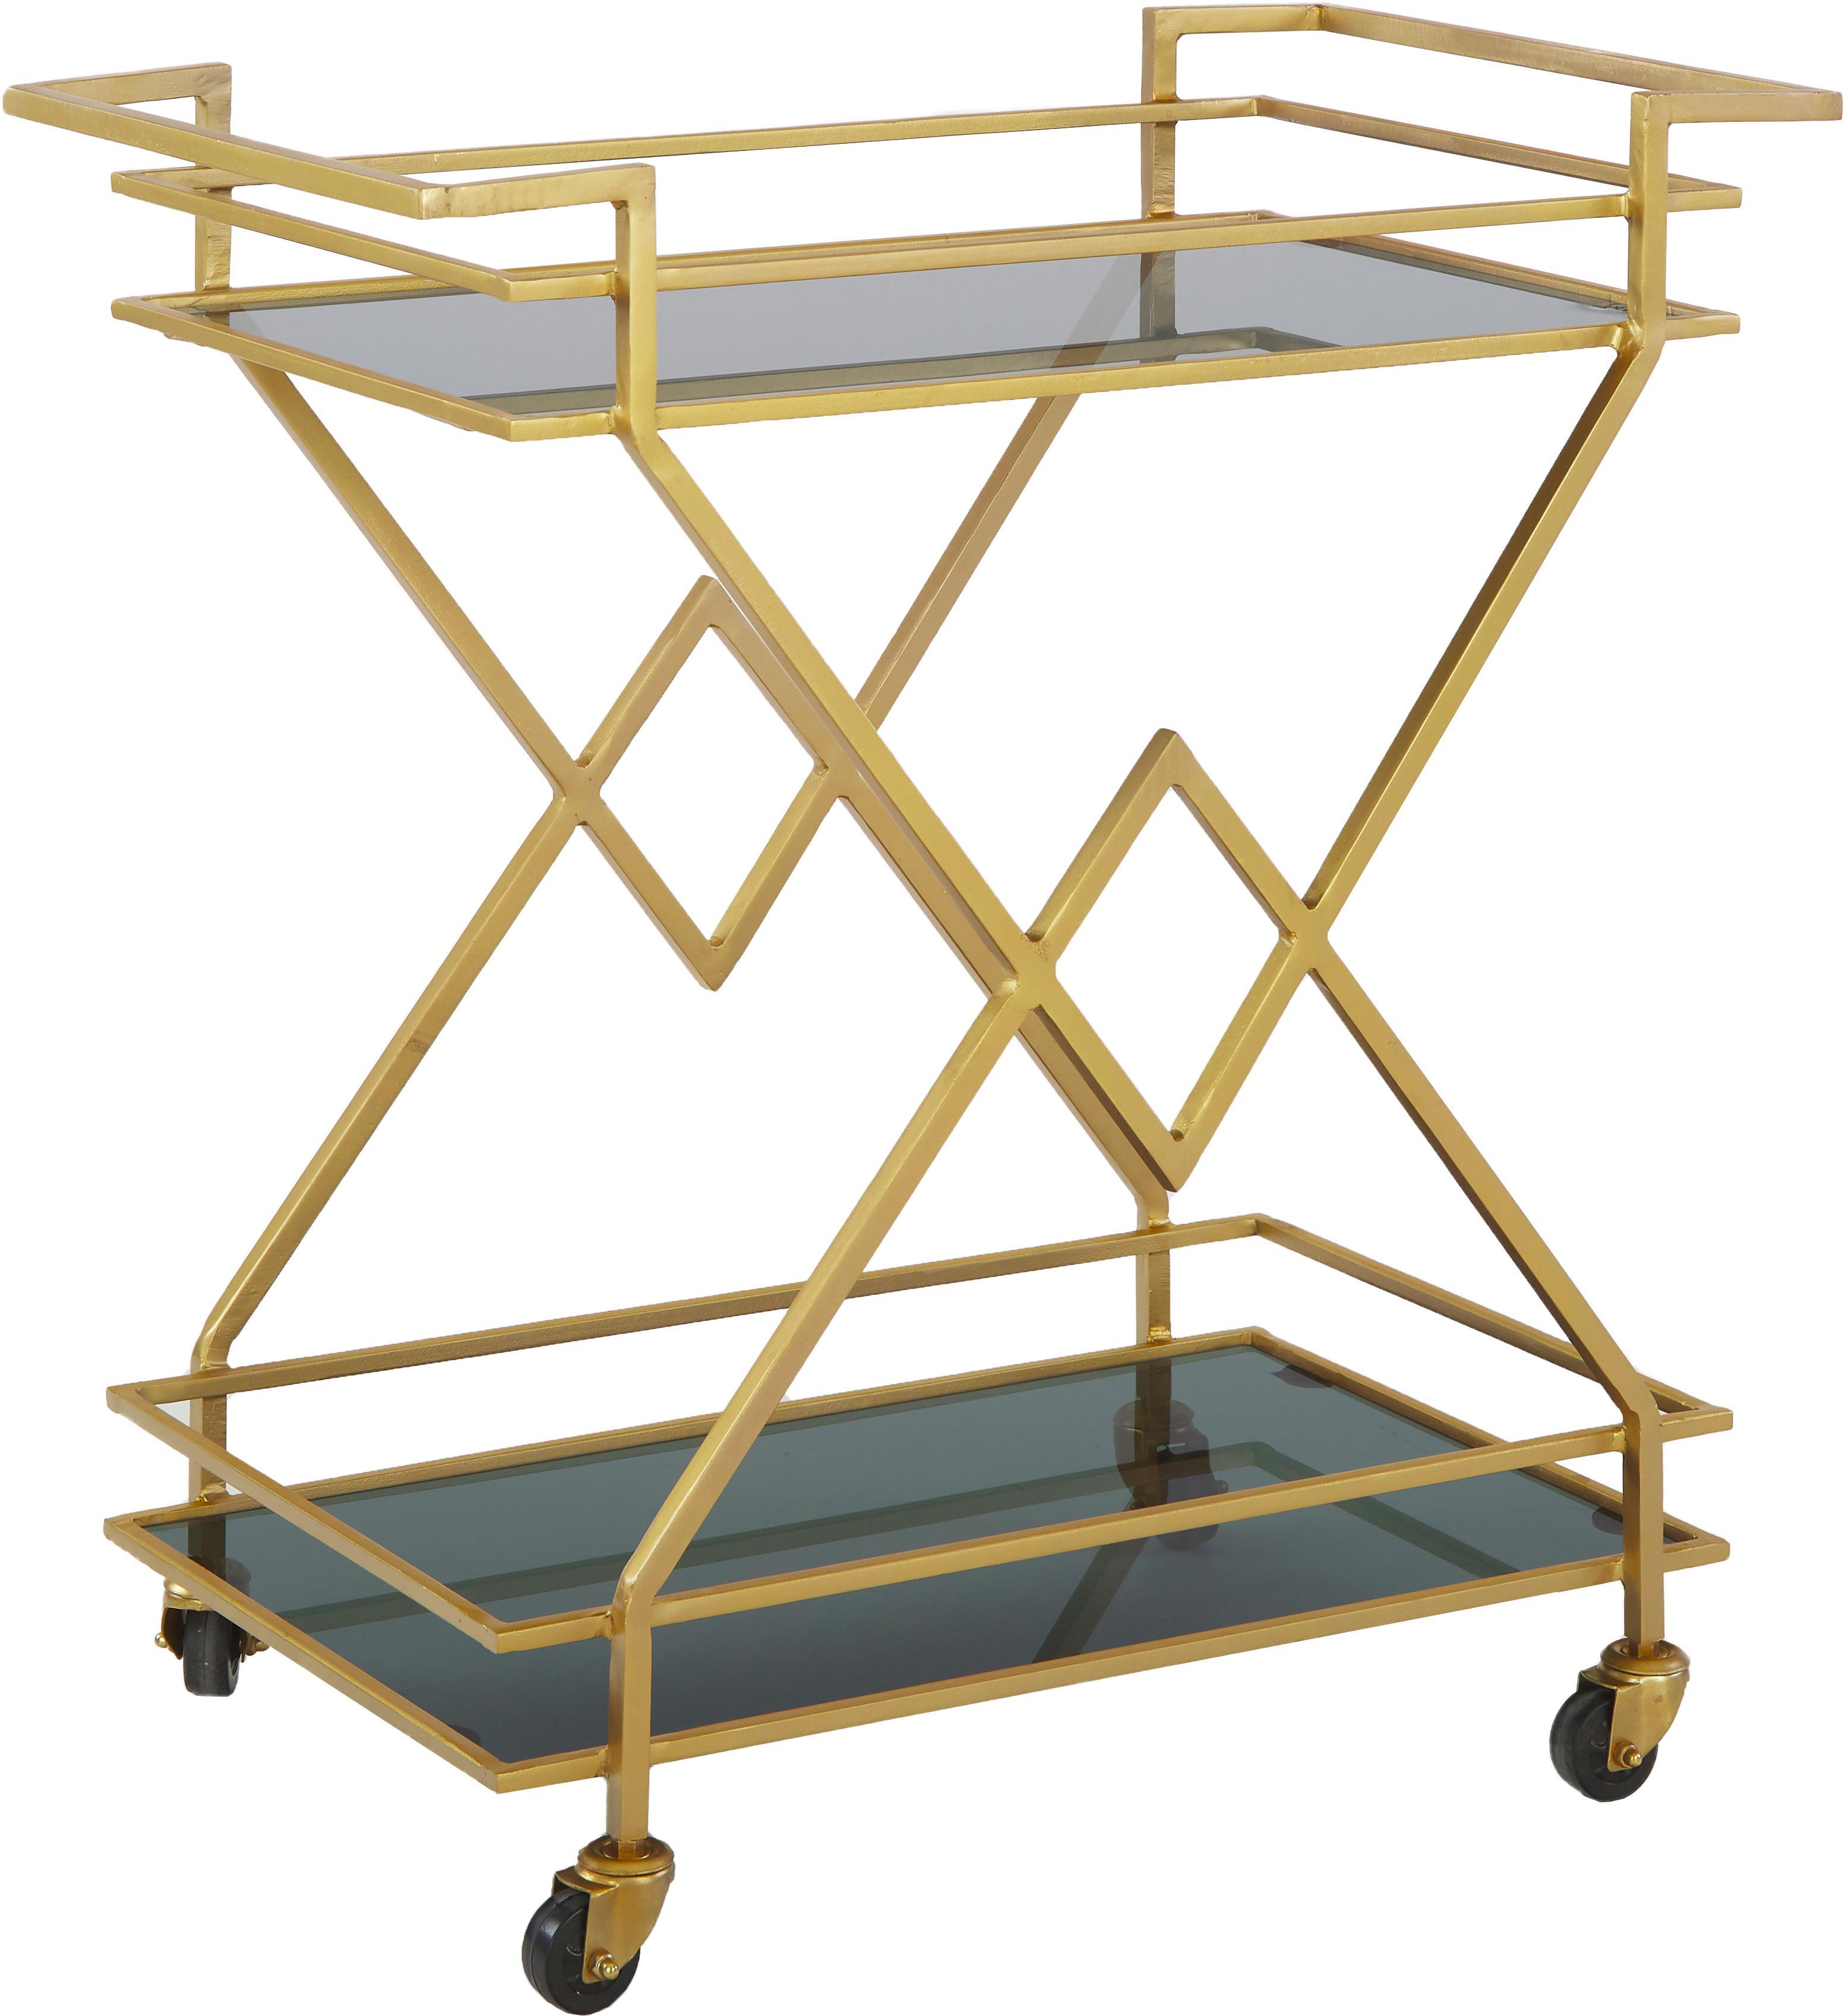 Barcart Ben goudkleurig, Plateaus: getint glas, Frame: gelakt metaal, Wieltjes: kunststof, Goudkleurig, transparant, 76 x 80 cm